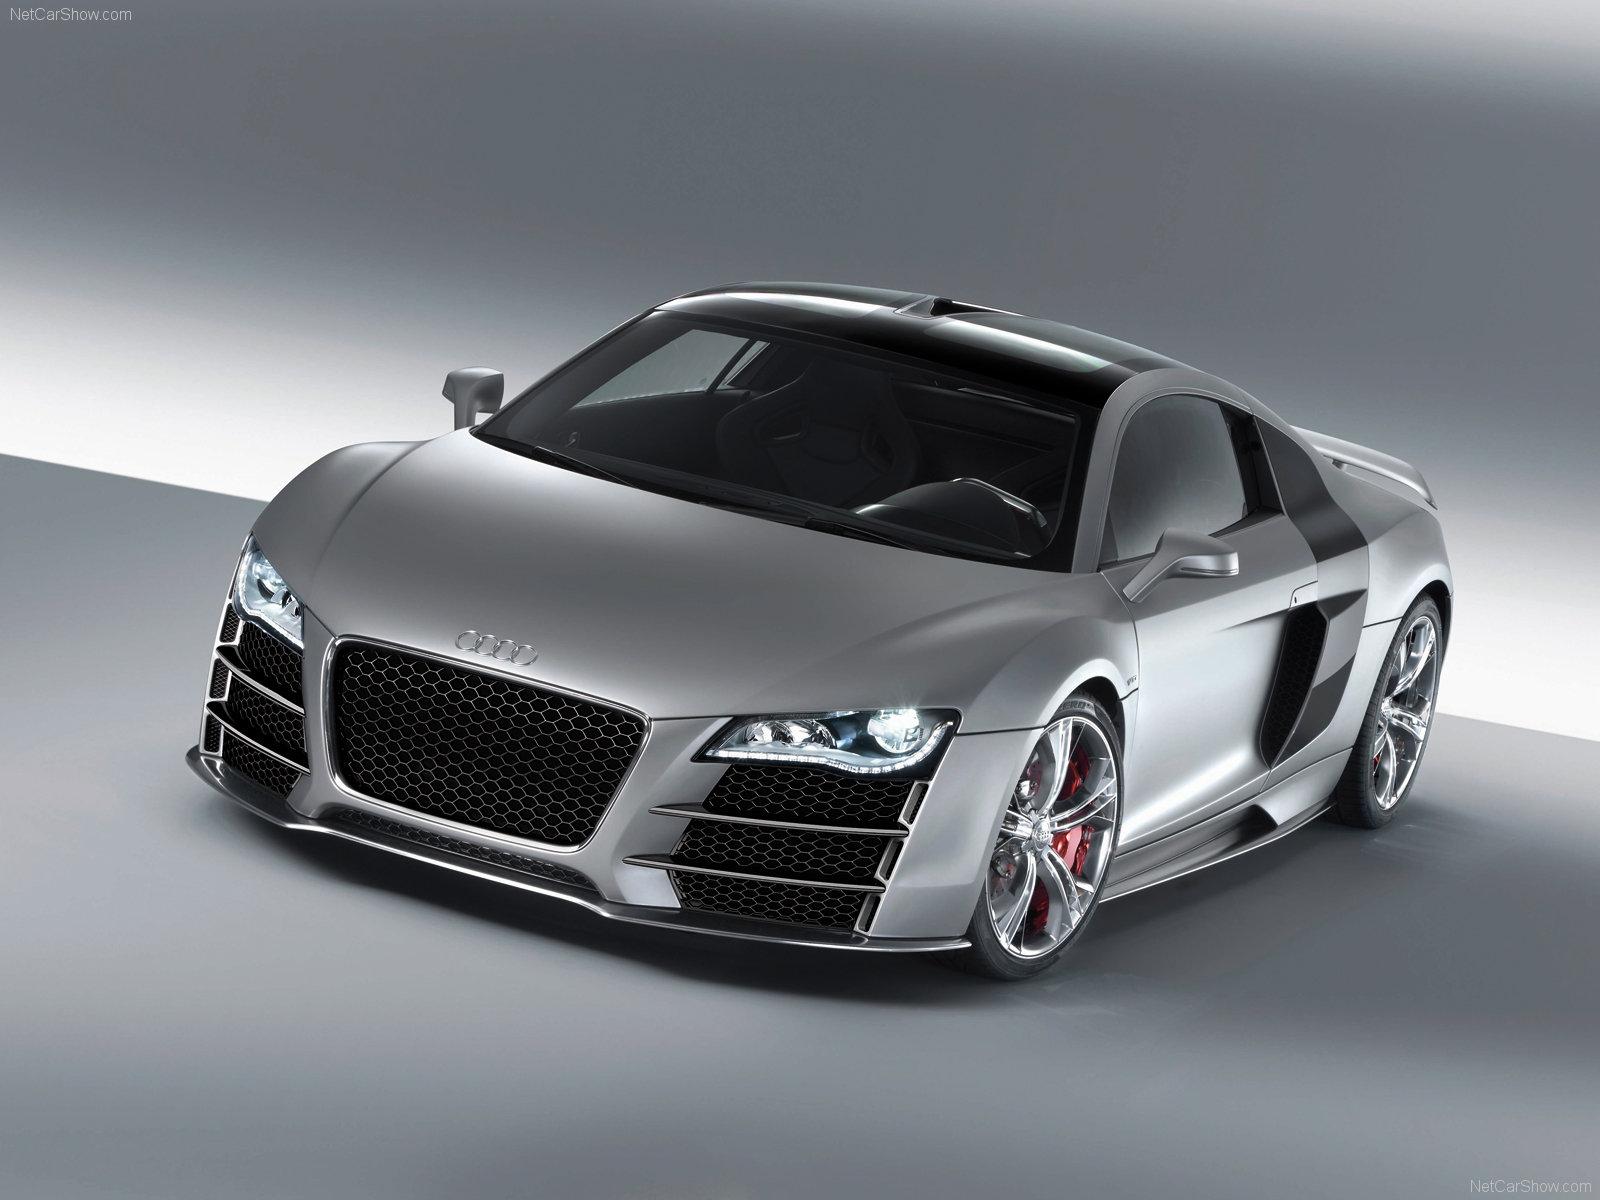 ... New Audi R8 22 Audi ...